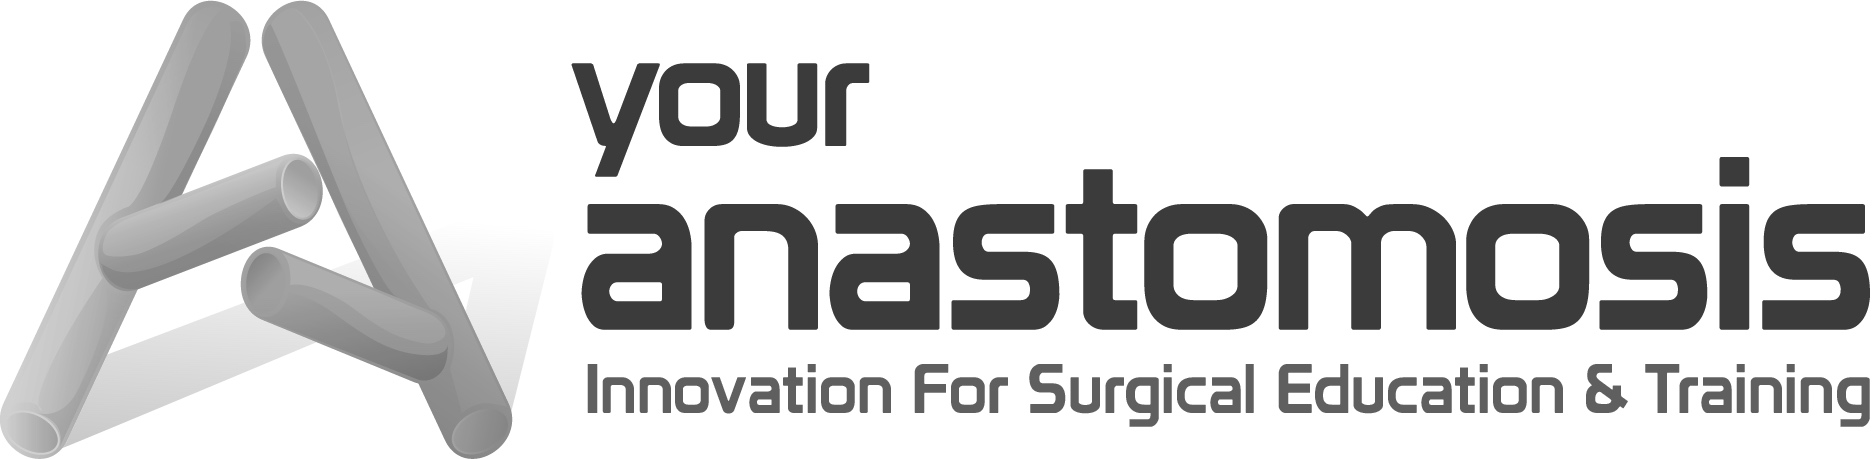 your-anastomosis-logo-tagline.jpg